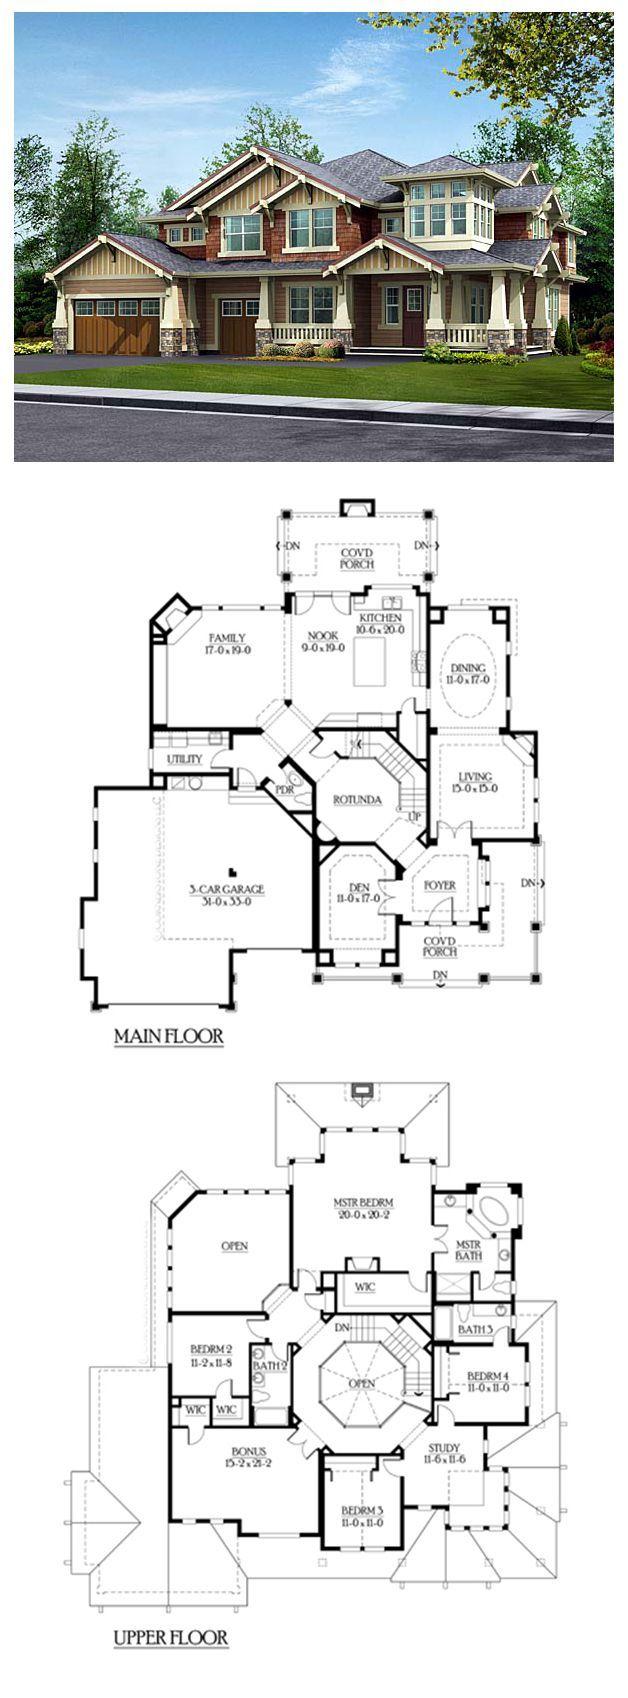 182 best home floorplans images on pinterest house for Dream kitchen floor plans